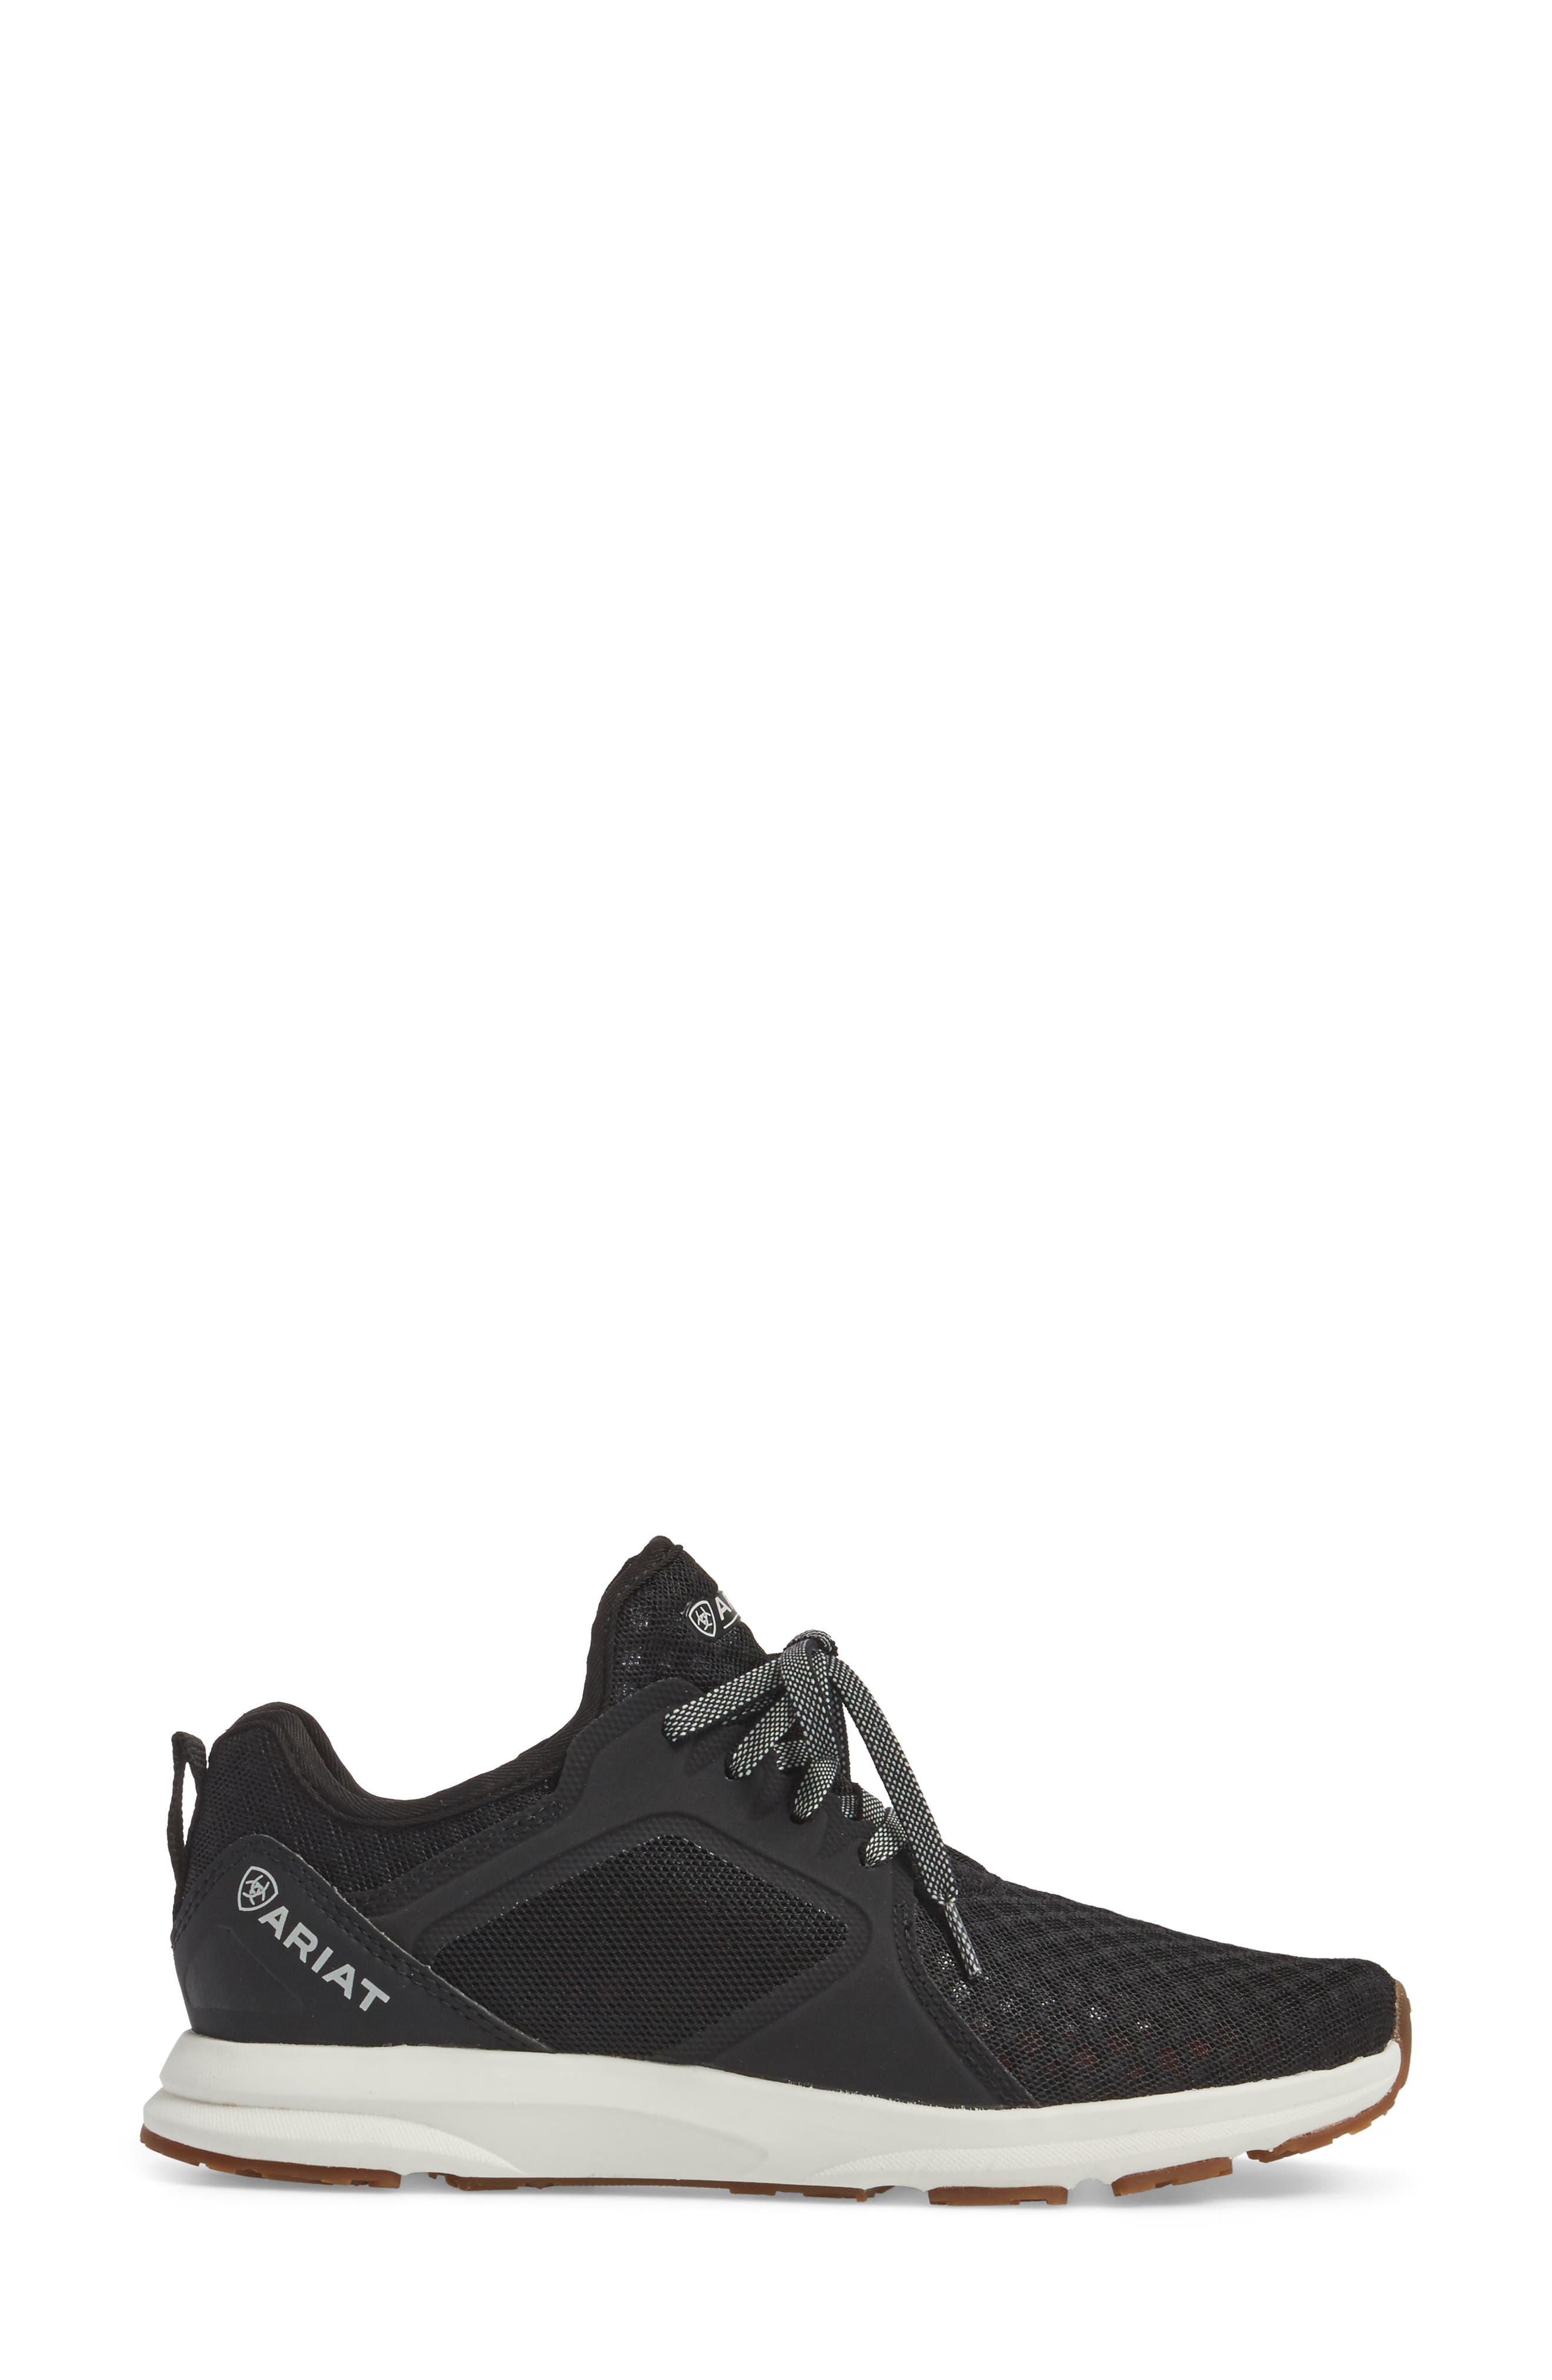 Fuse Sneaker,                             Alternate thumbnail 3, color,                             001